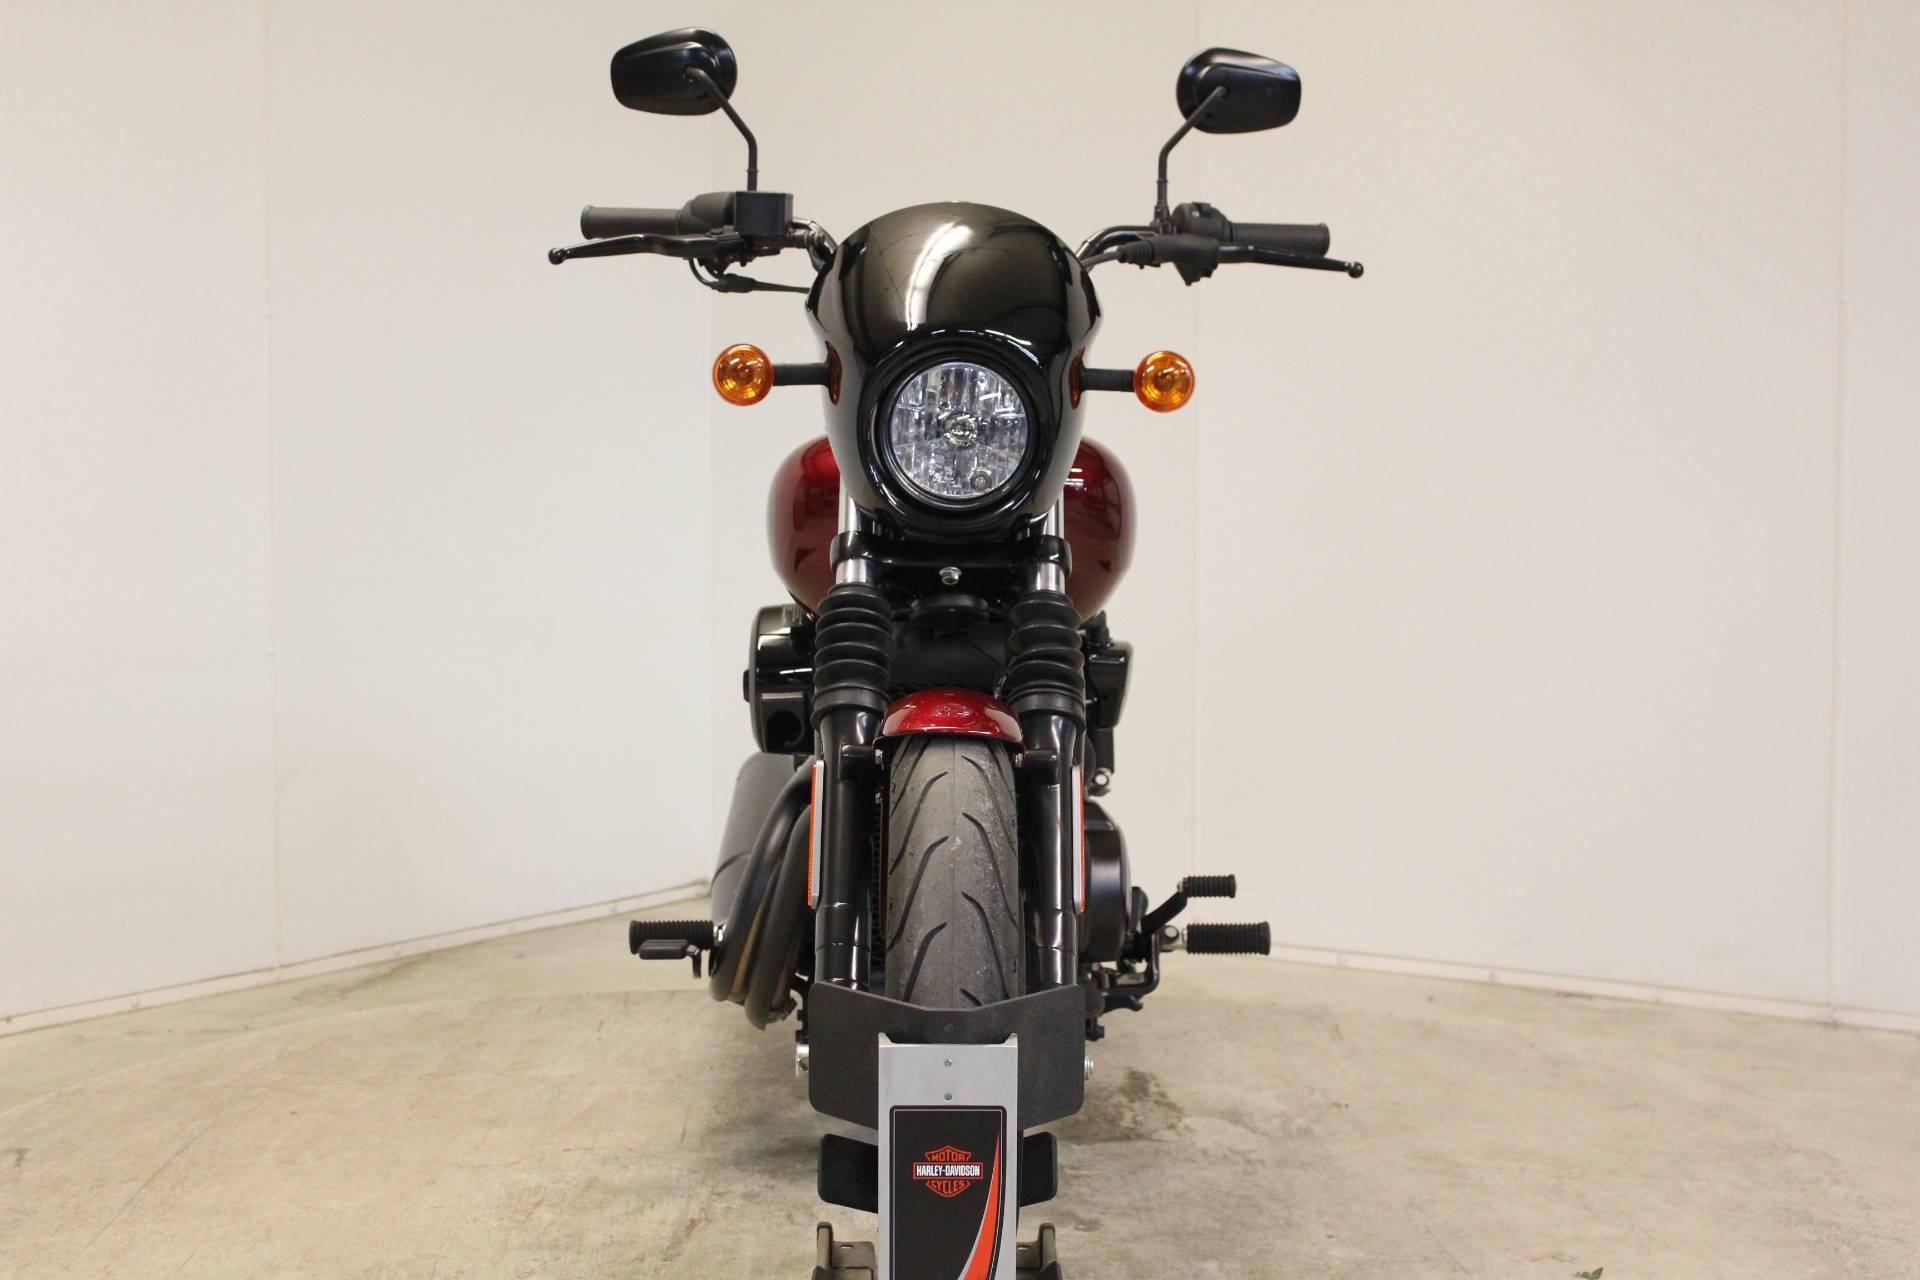 2017 Harley-Davidson Street 750 3